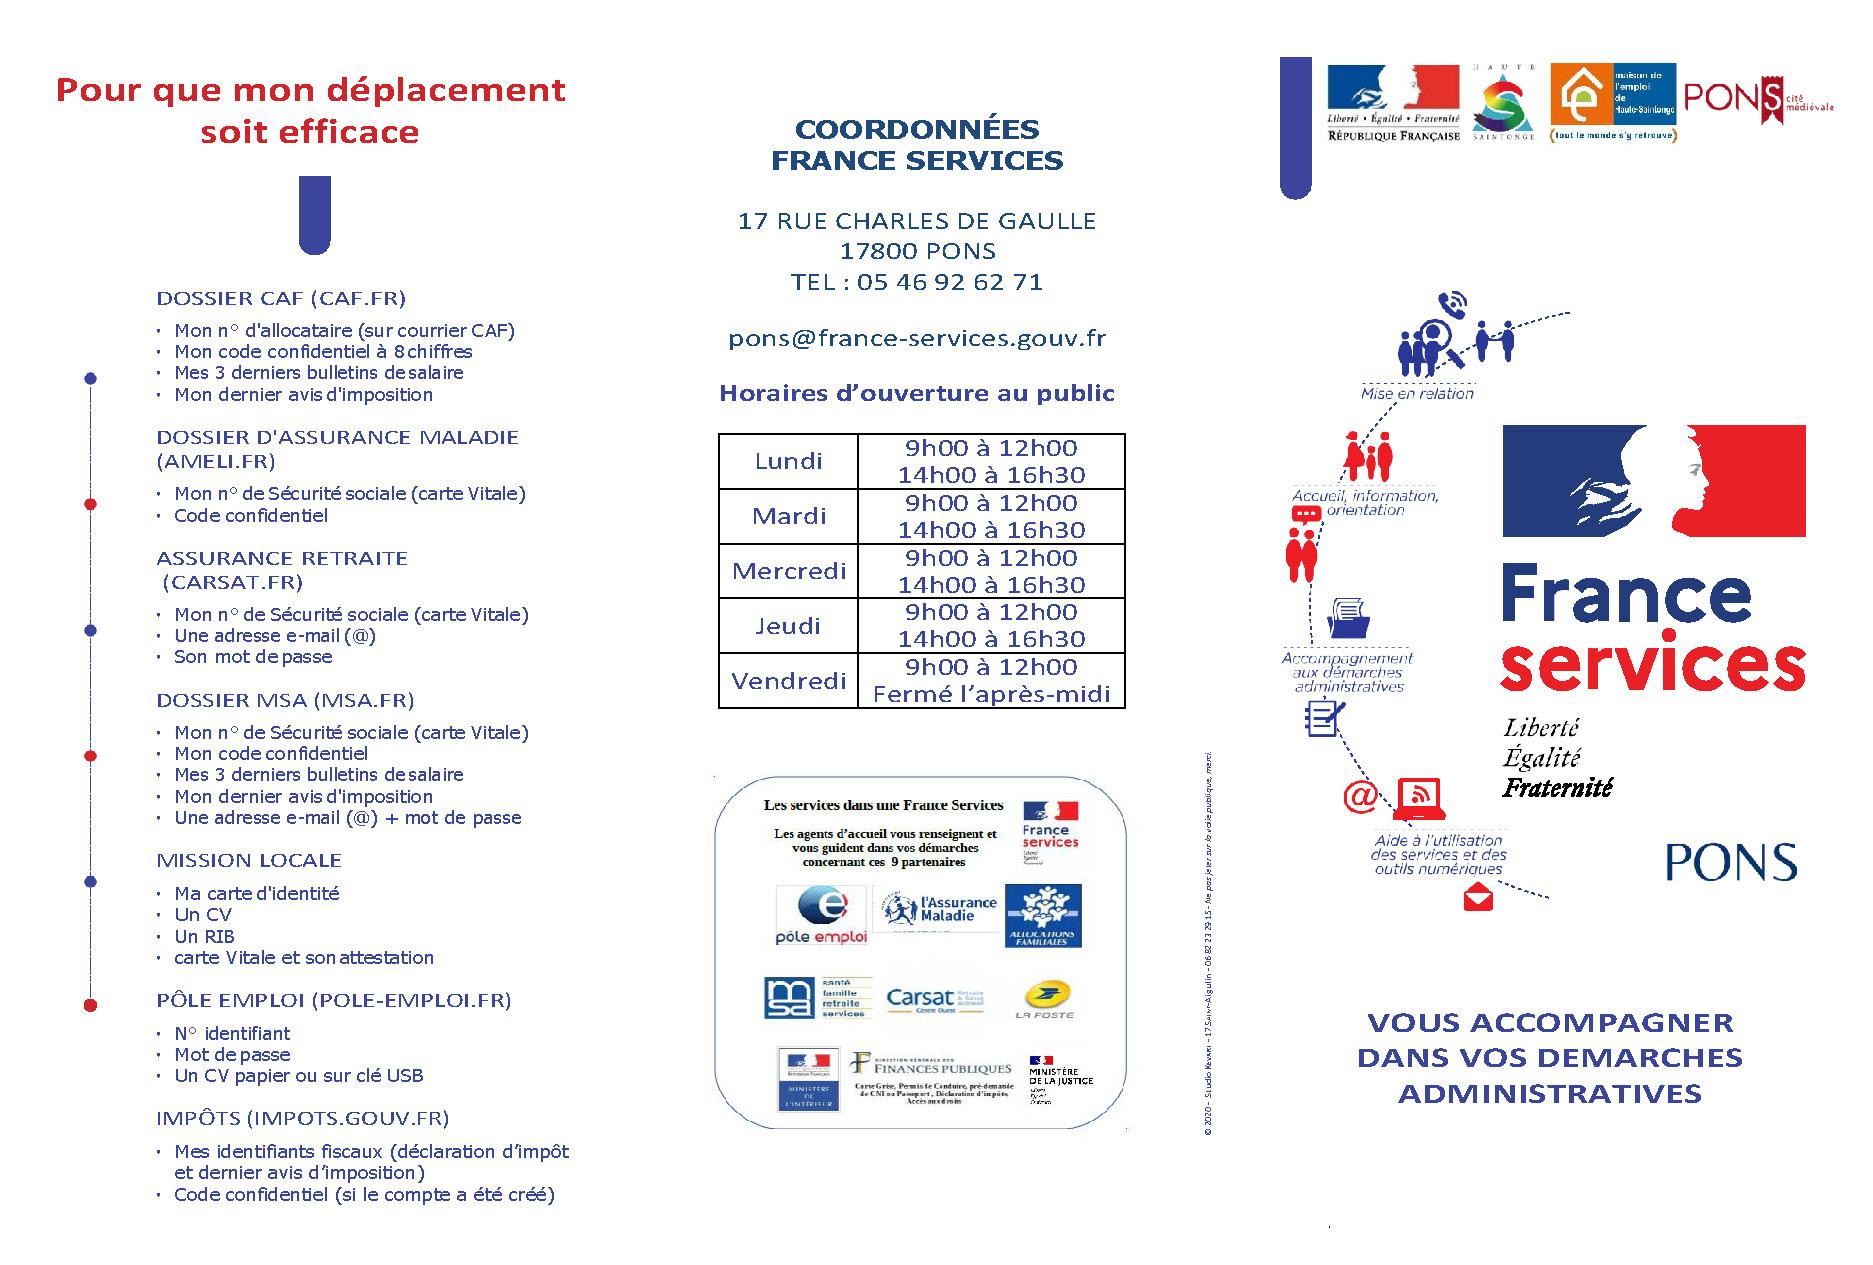 Flyer France services Pons 2021